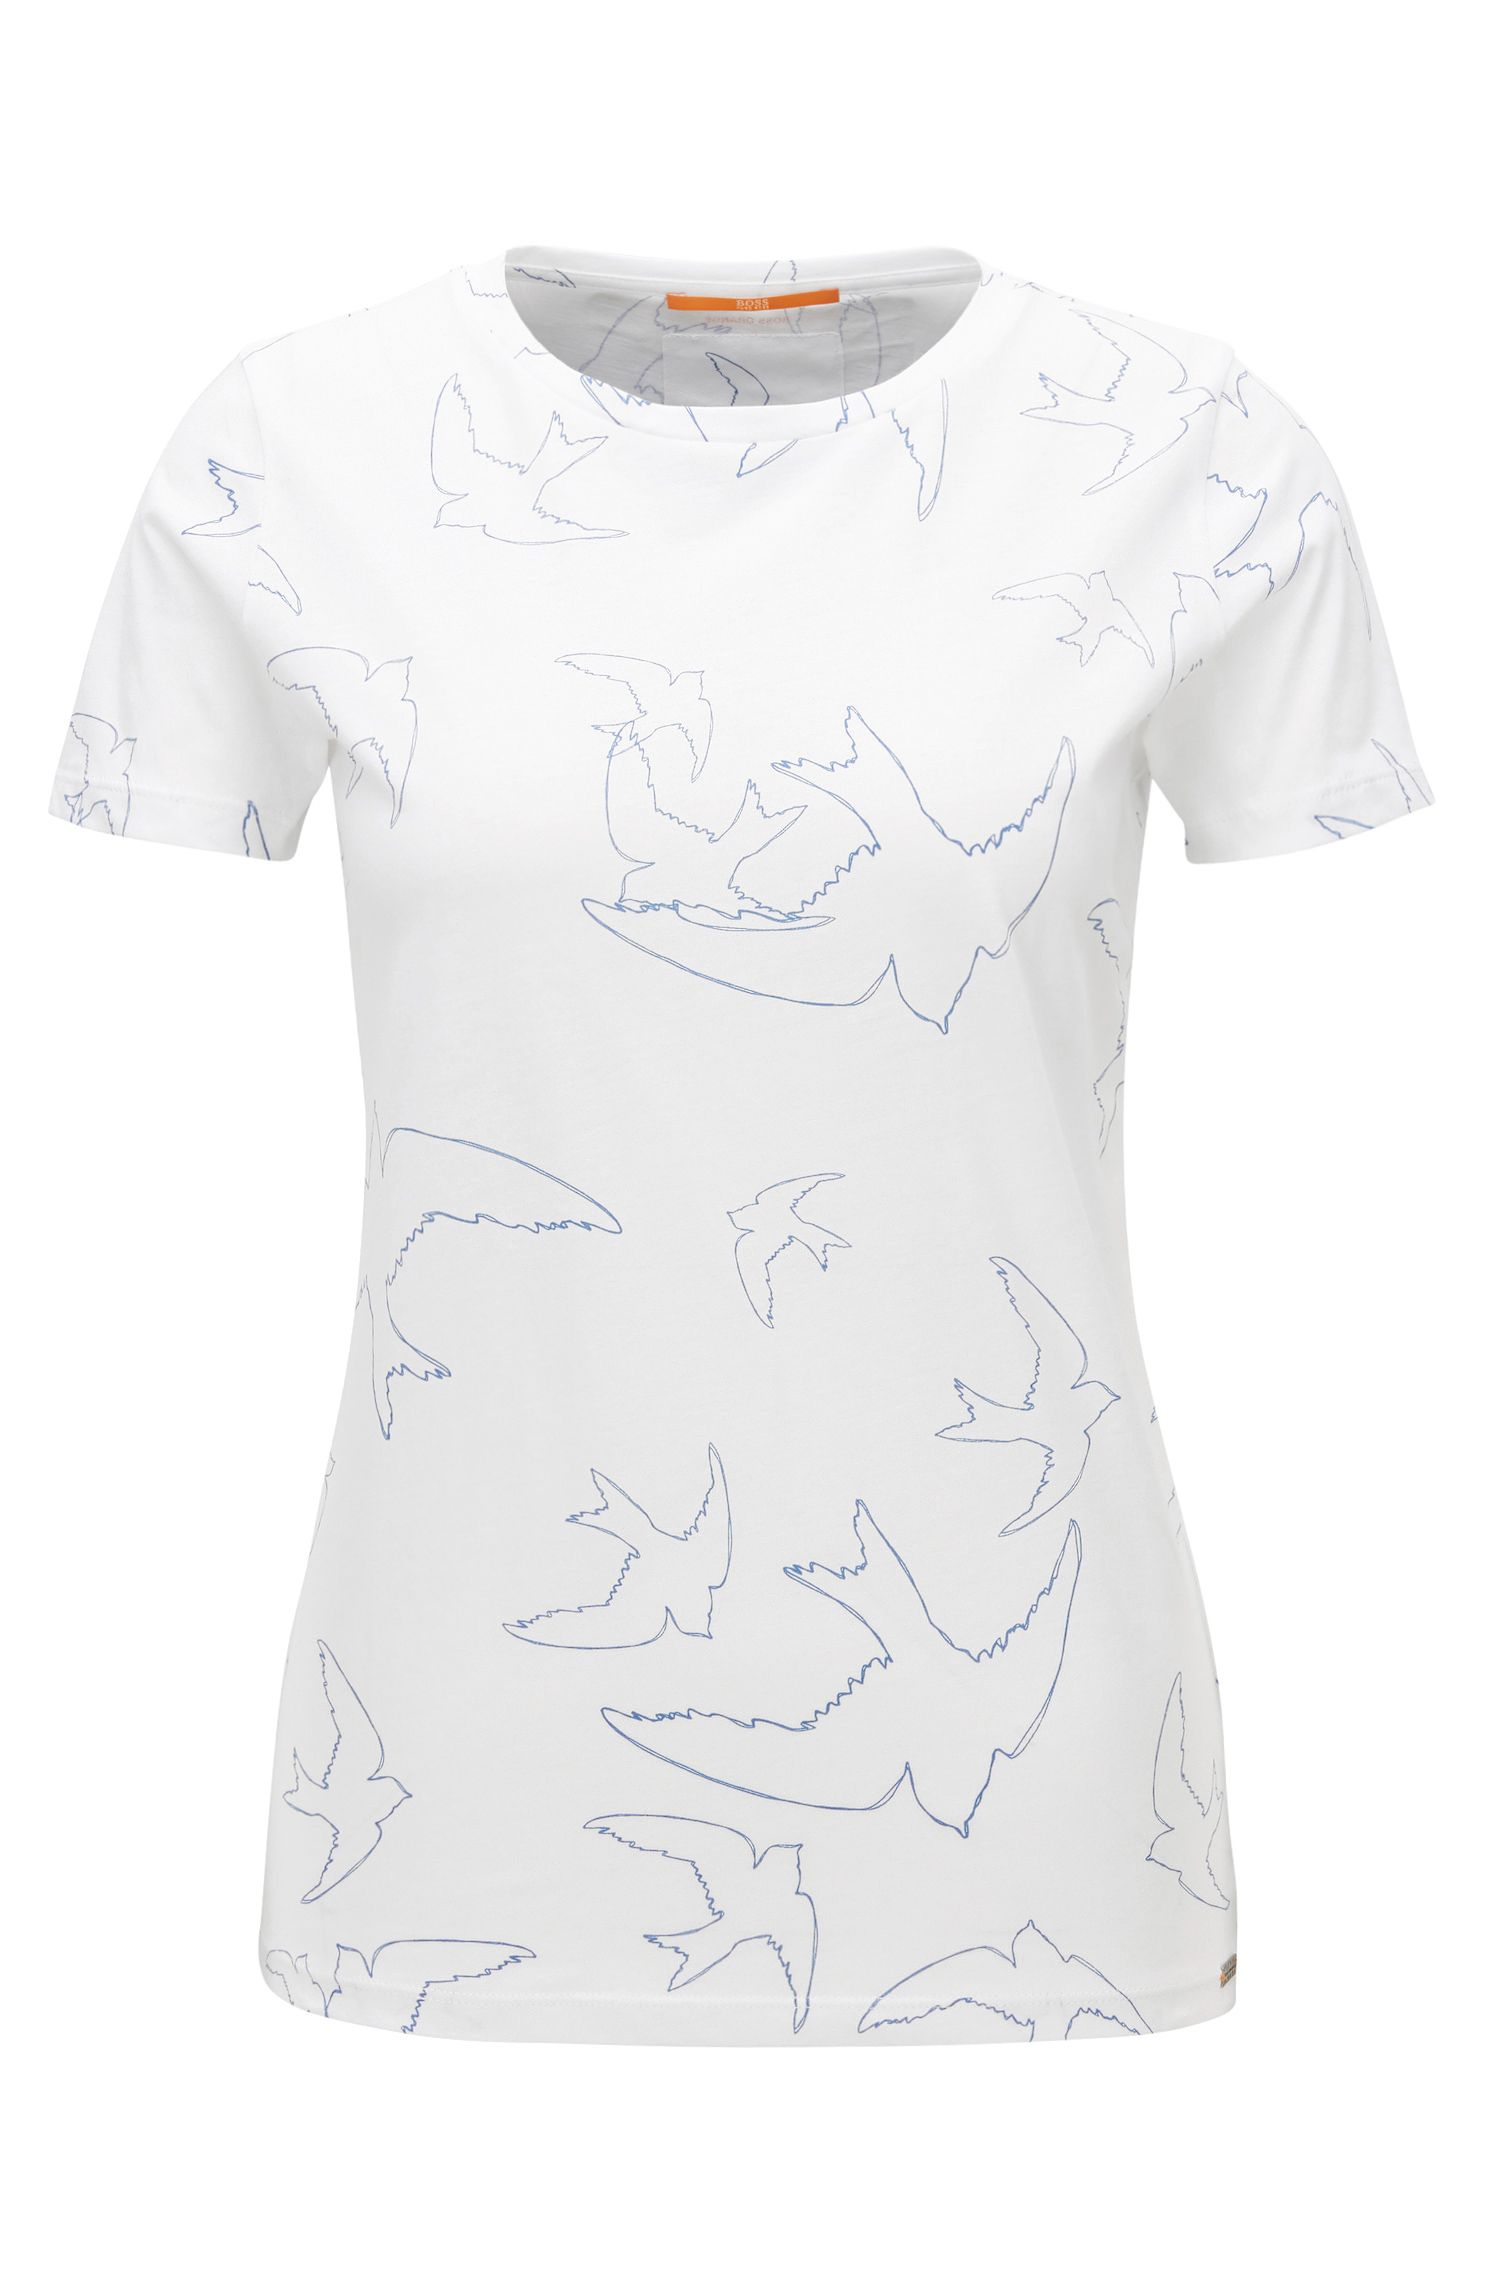 Slim-fit single jersey T-shirt in a bird motif